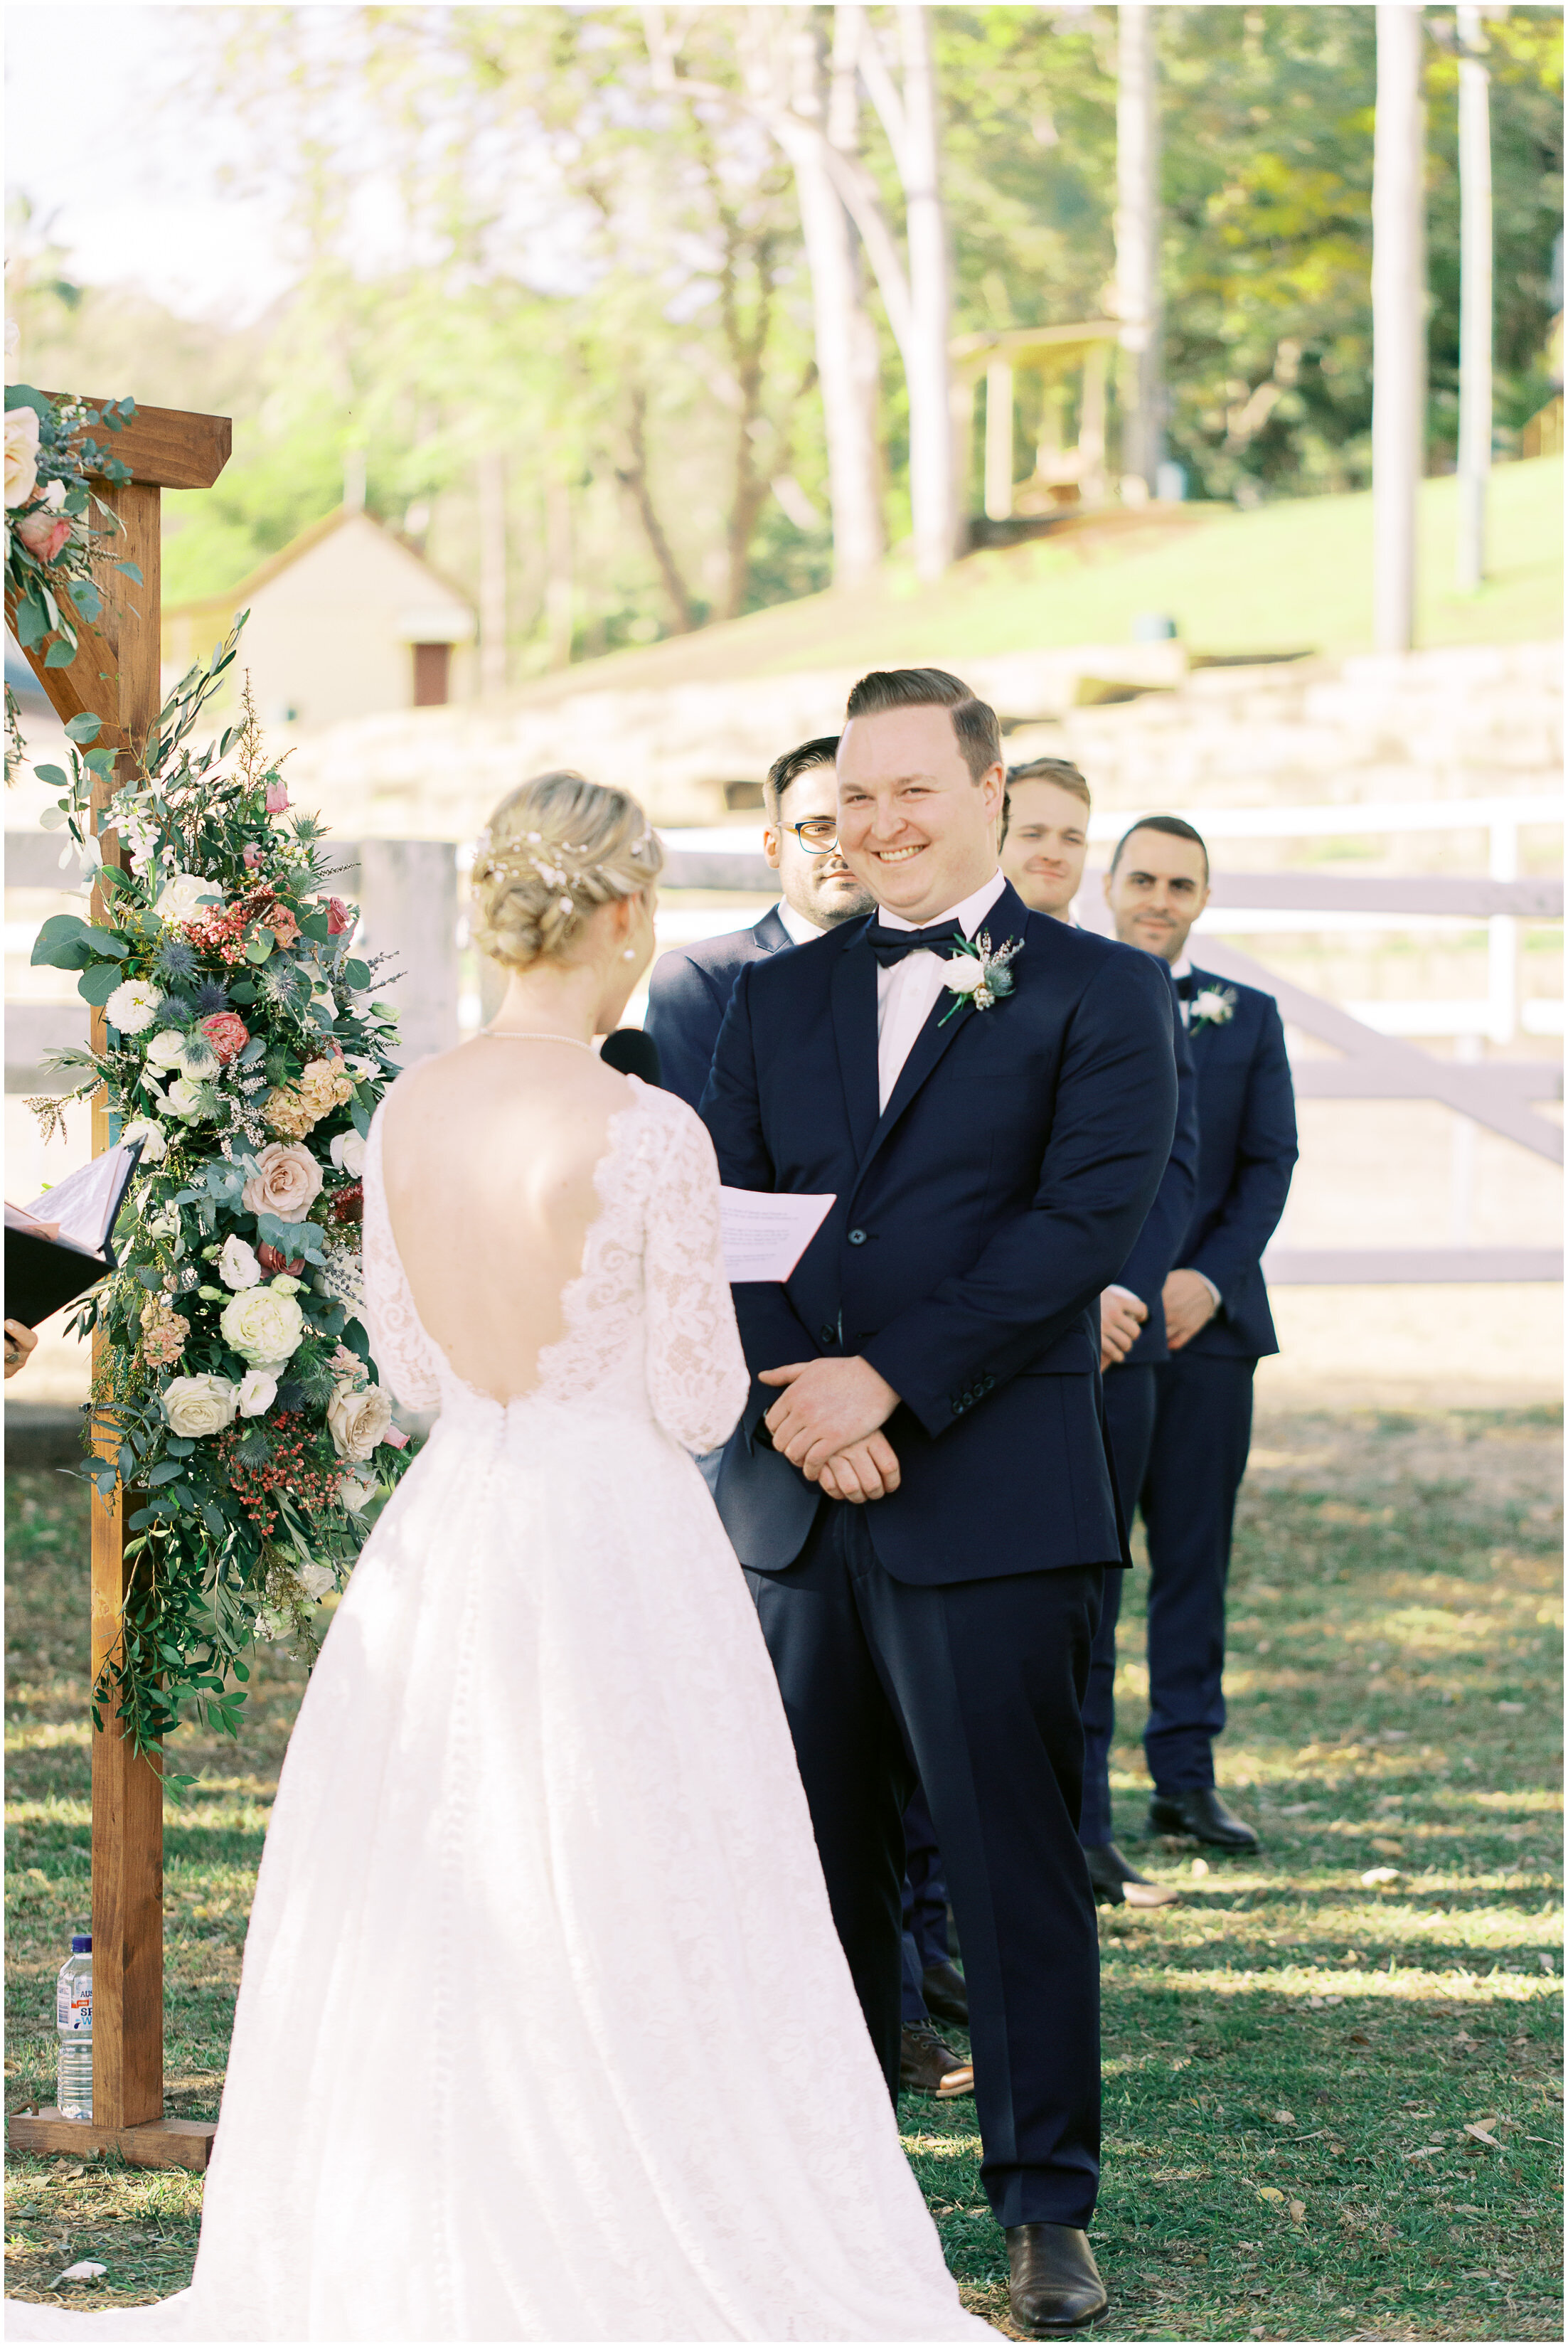 brisbane-fine-art-wedding-photographer-lauren-olivia-luxury-wedding-australia-11.jpg